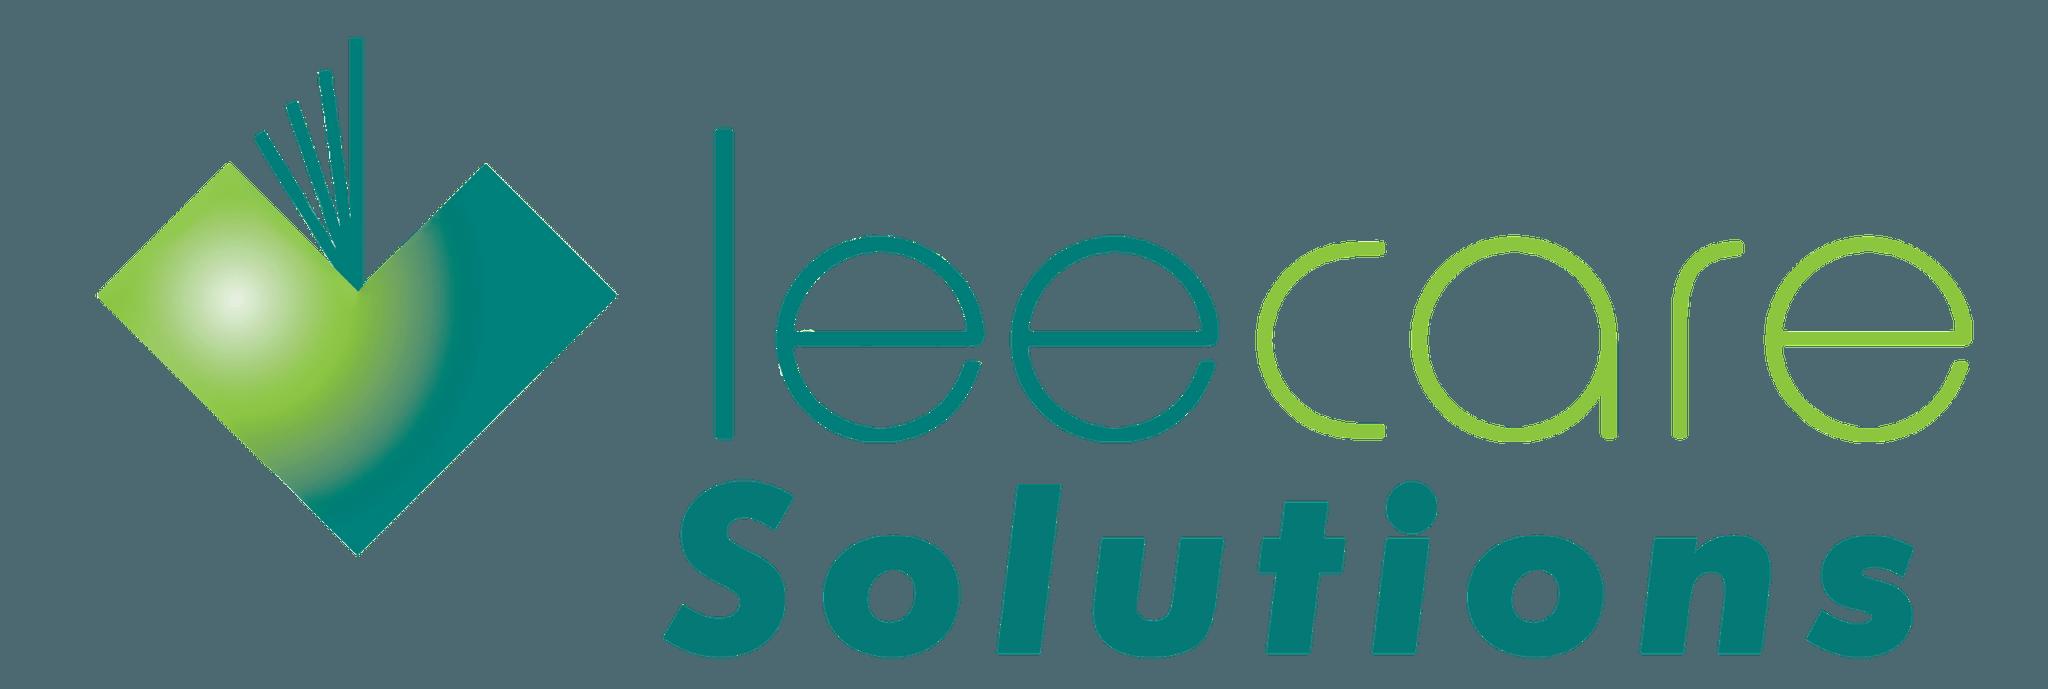 Leecare Solutions